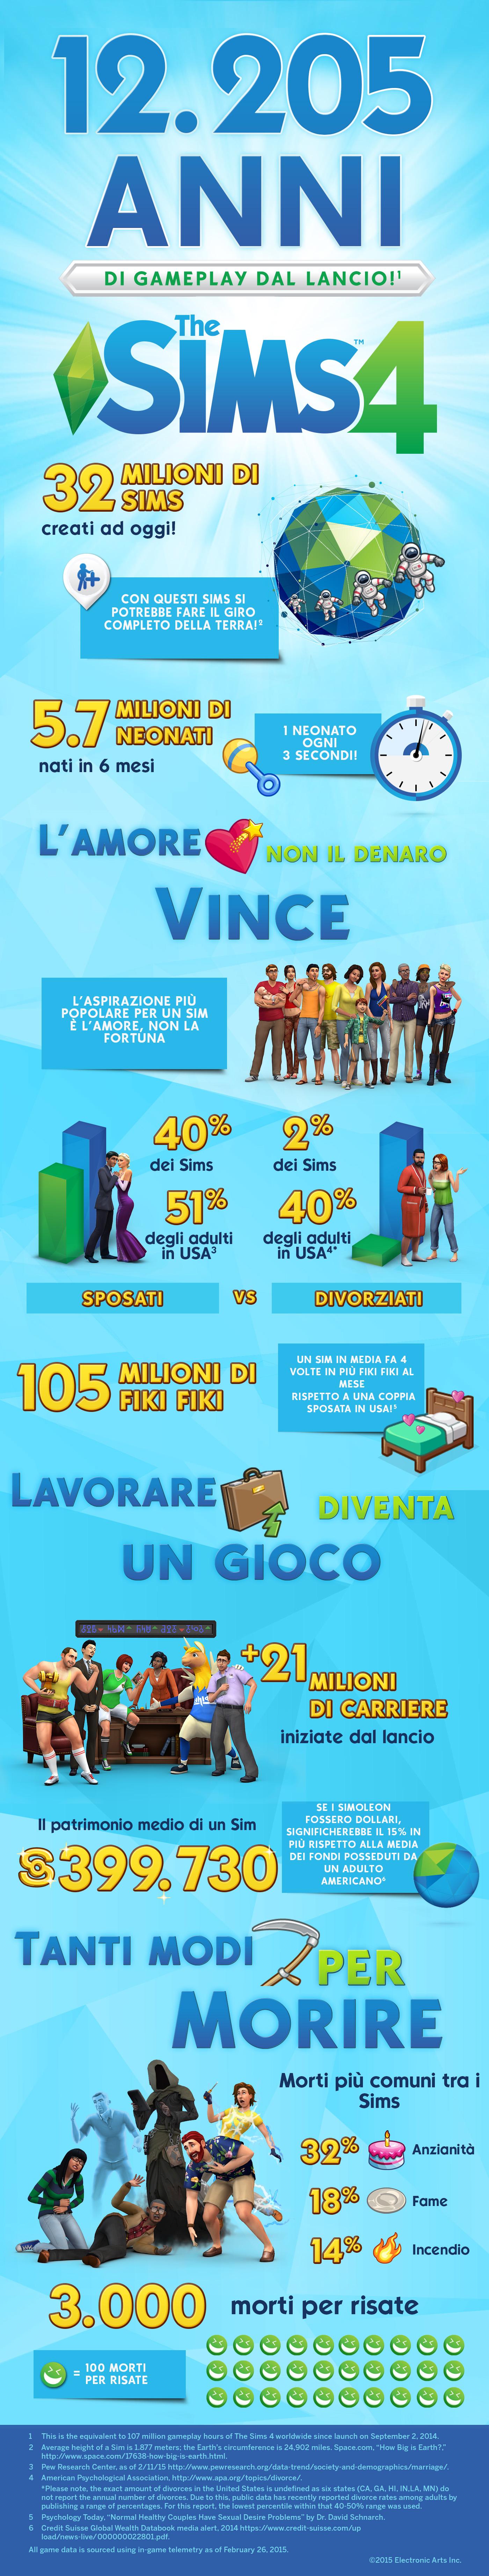 EA_The_Sims_4_Infografica